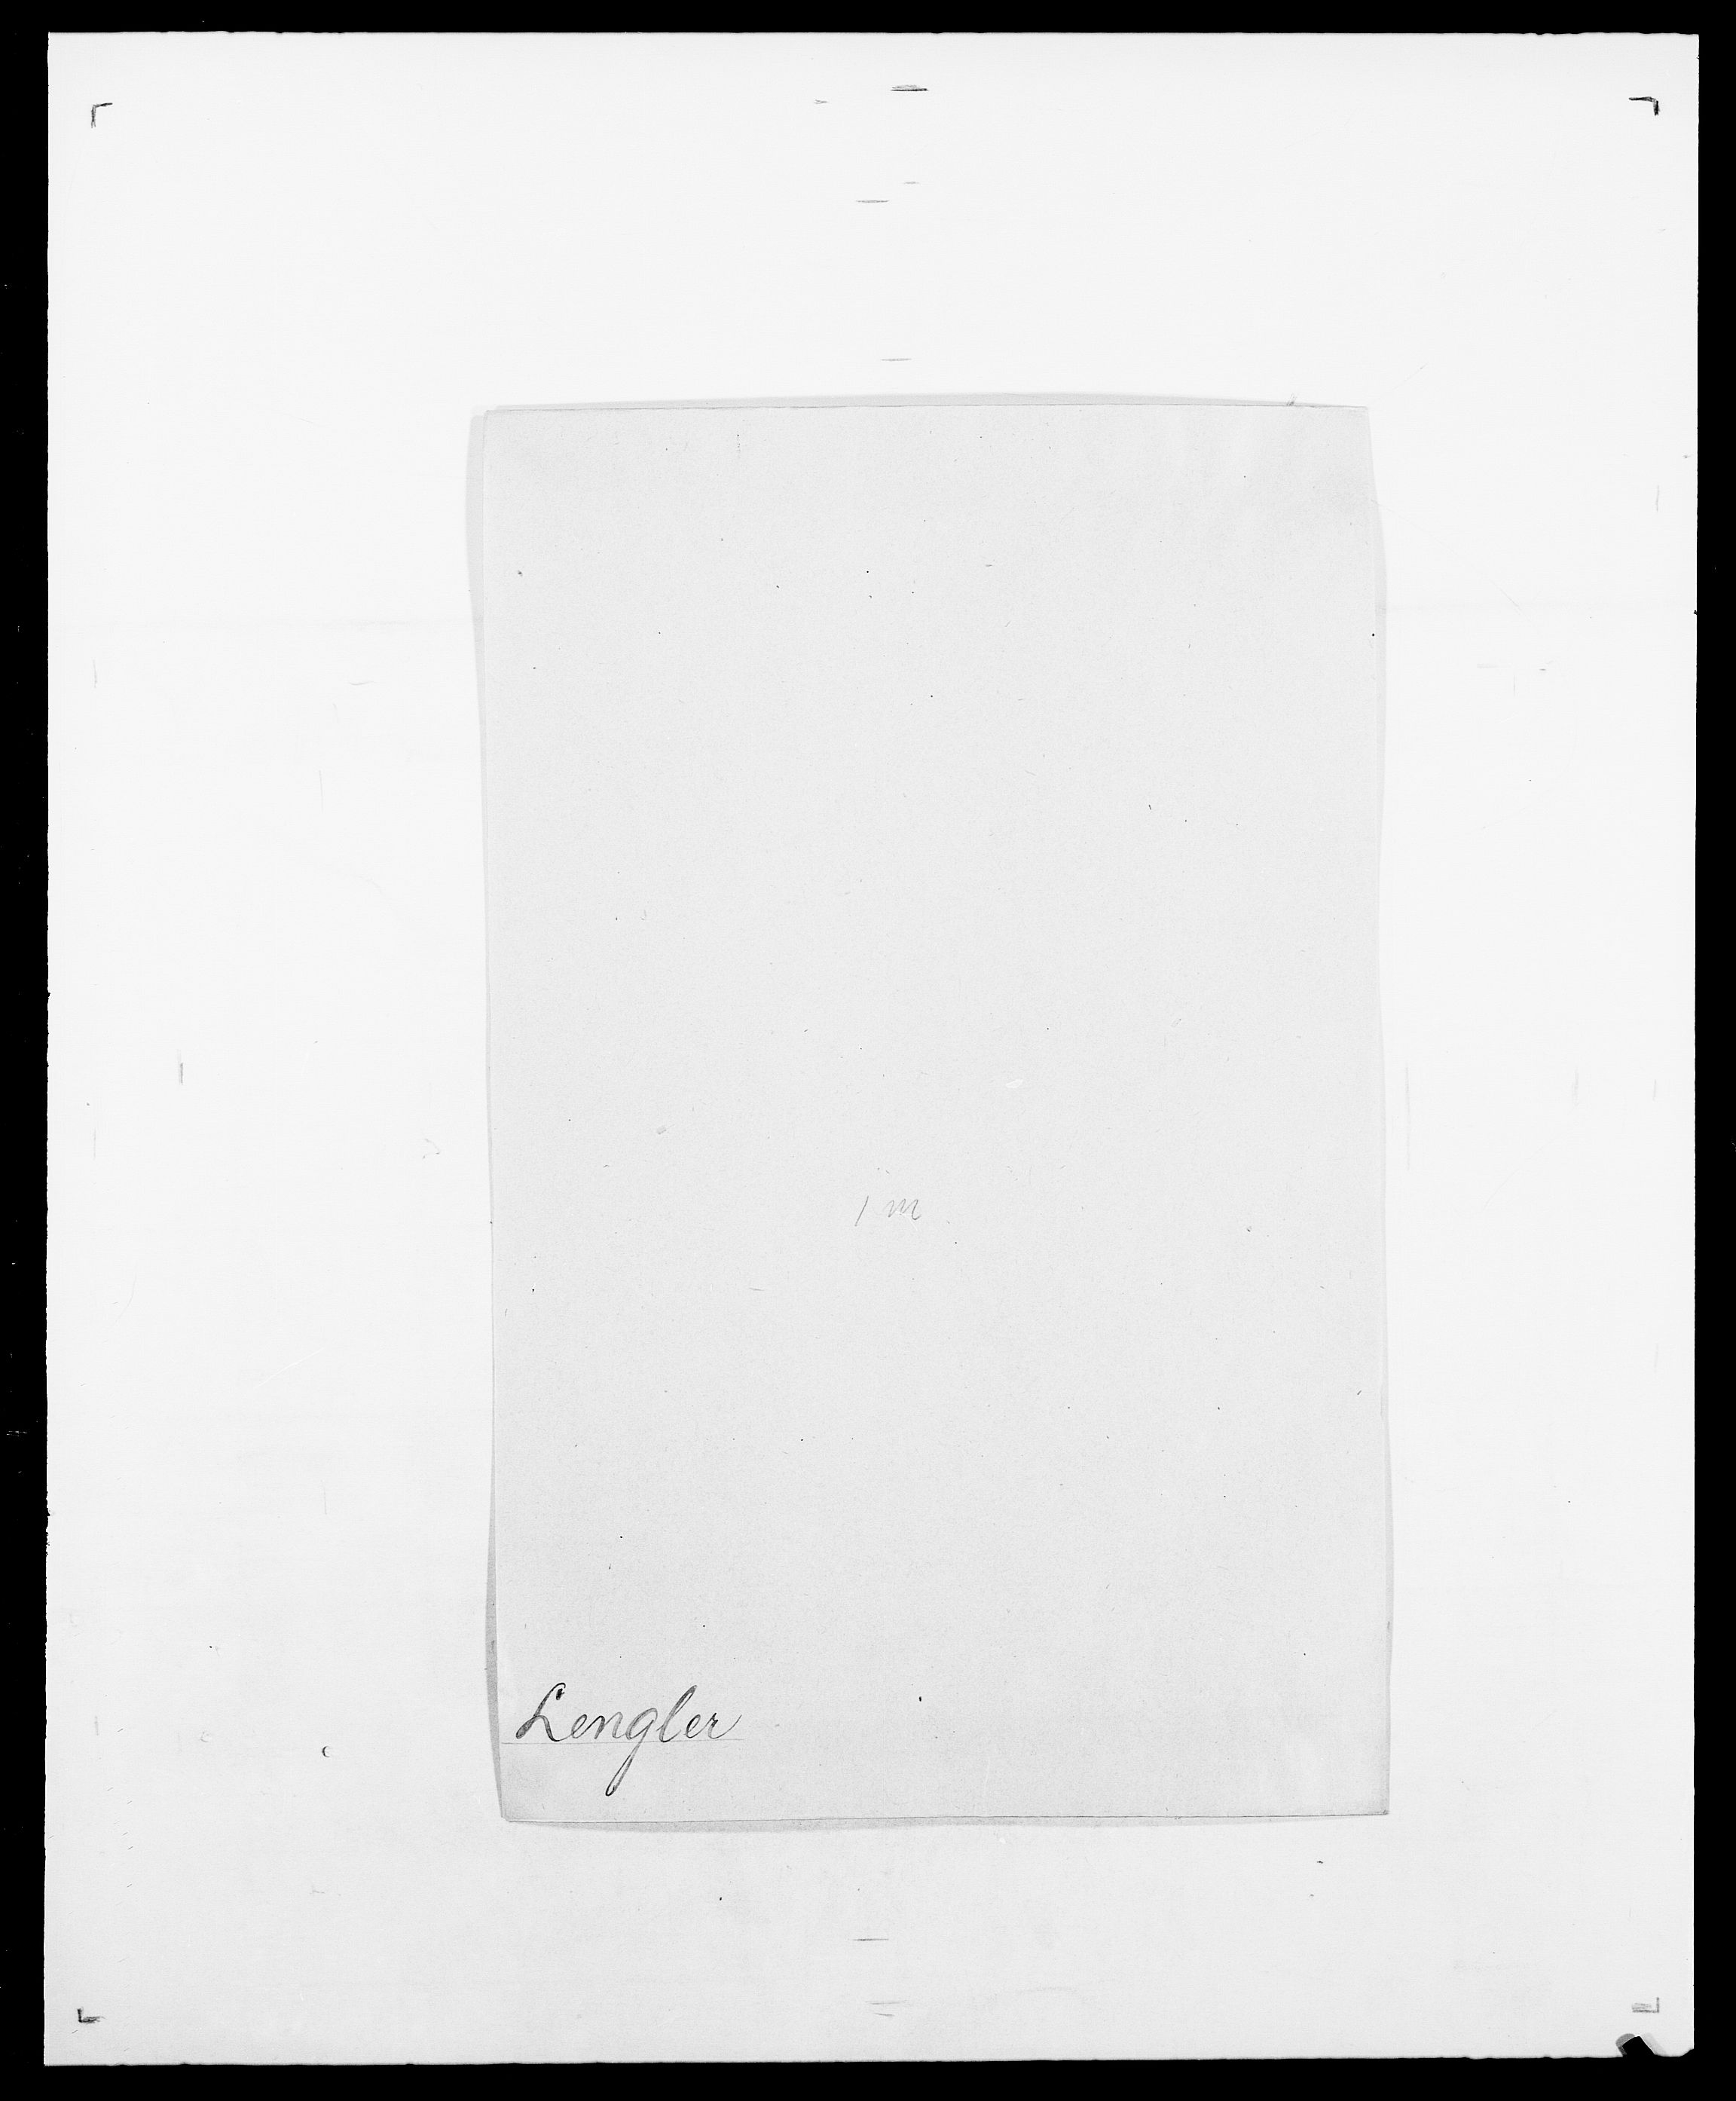 SAO, Delgobe, Charles Antoine - samling, D/Da/L0023: Lau - Lirvyn, s. 221